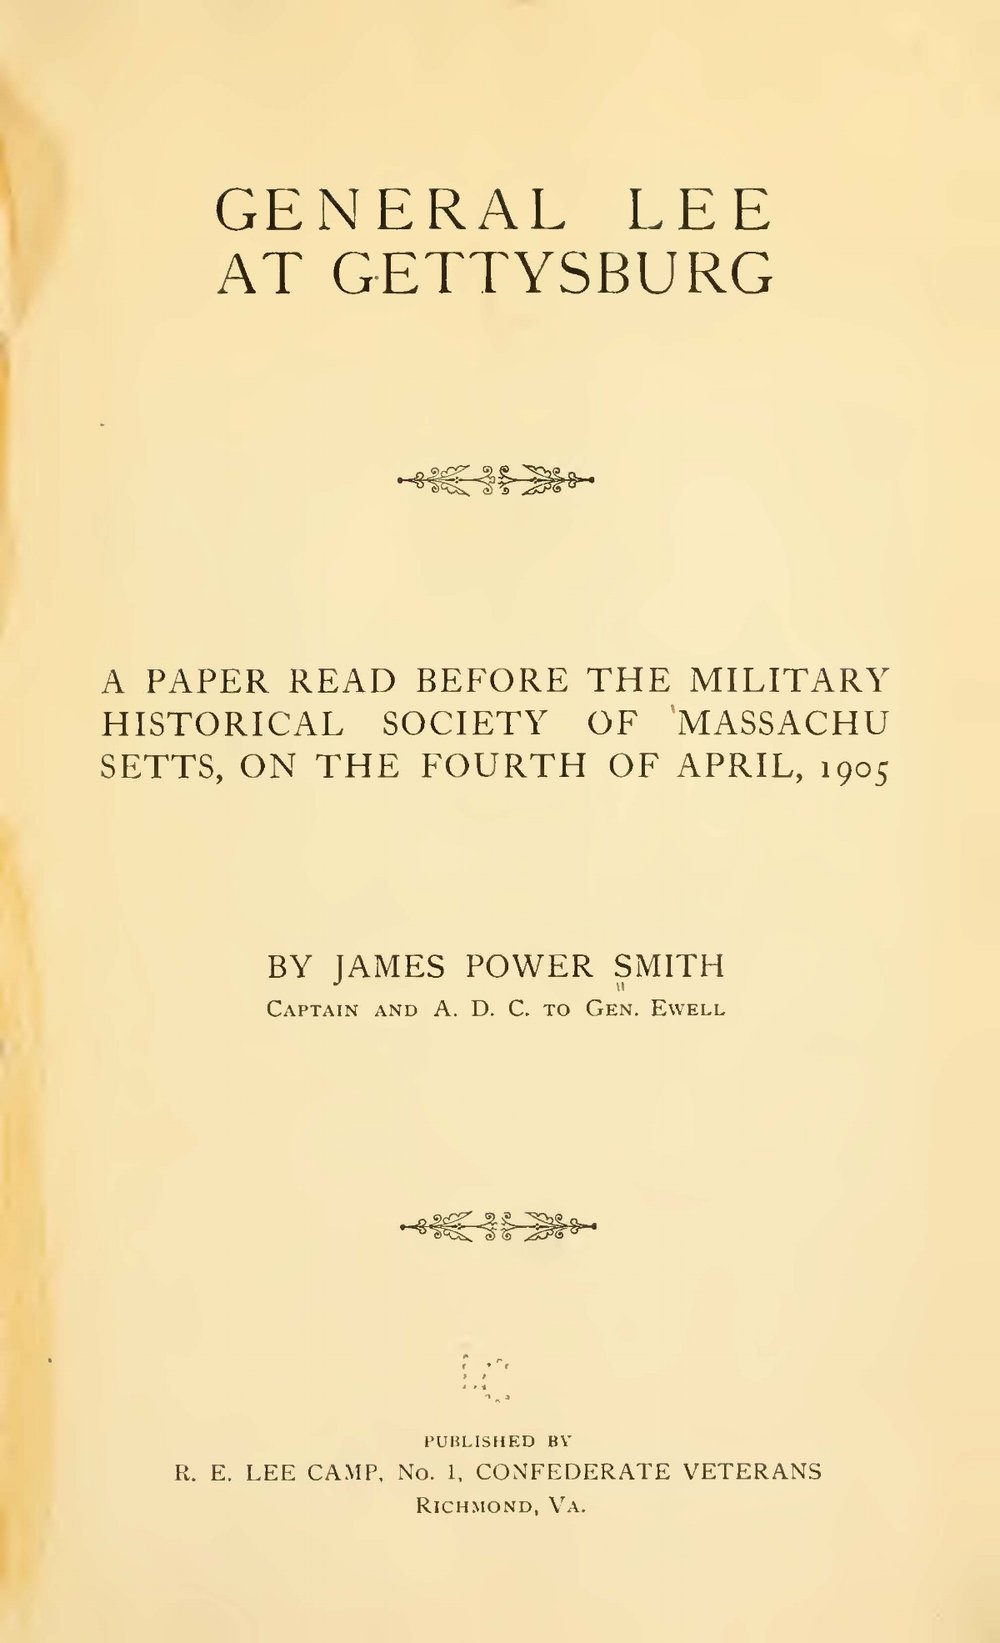 Smith, James Power, General Lee at Gettysburg Title Page.jpg